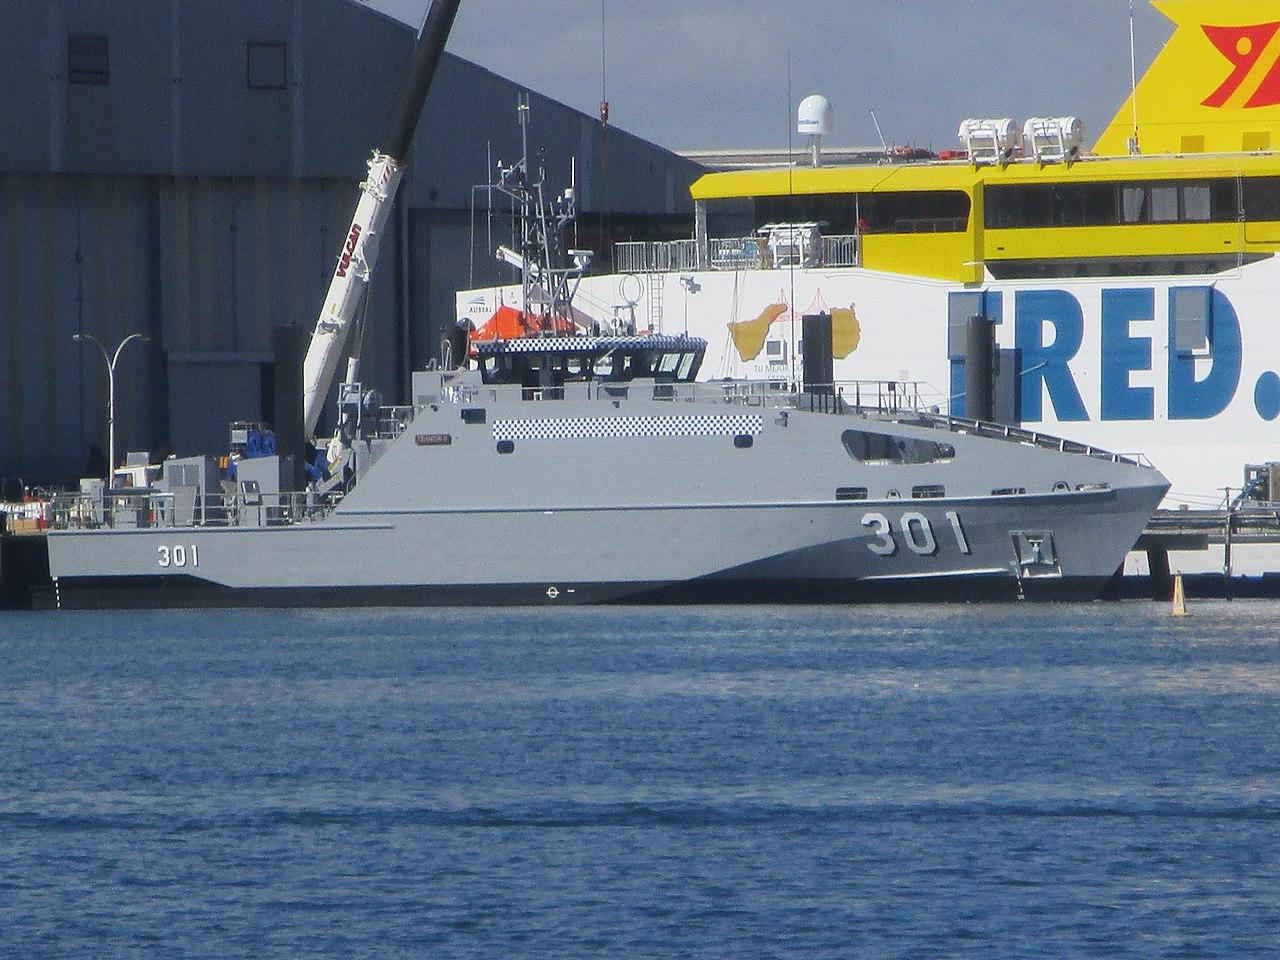 https://upload.wikimedia.org/wikipedia/commons/thumb/1/14/Bajamar_Express_and_RKS_Teanoai_II_%28301%29_at_Austal_shipyards_in_Henderson%2C_Western_Australia%2C_April_2020_01.jpg/1280px-Bajamar_Express_and_RKS_Teanoai_II_%28301%29_at_Austal_shipyards_in_Henderson%2C_Western_Australia%2C_April_2020_01.jpg